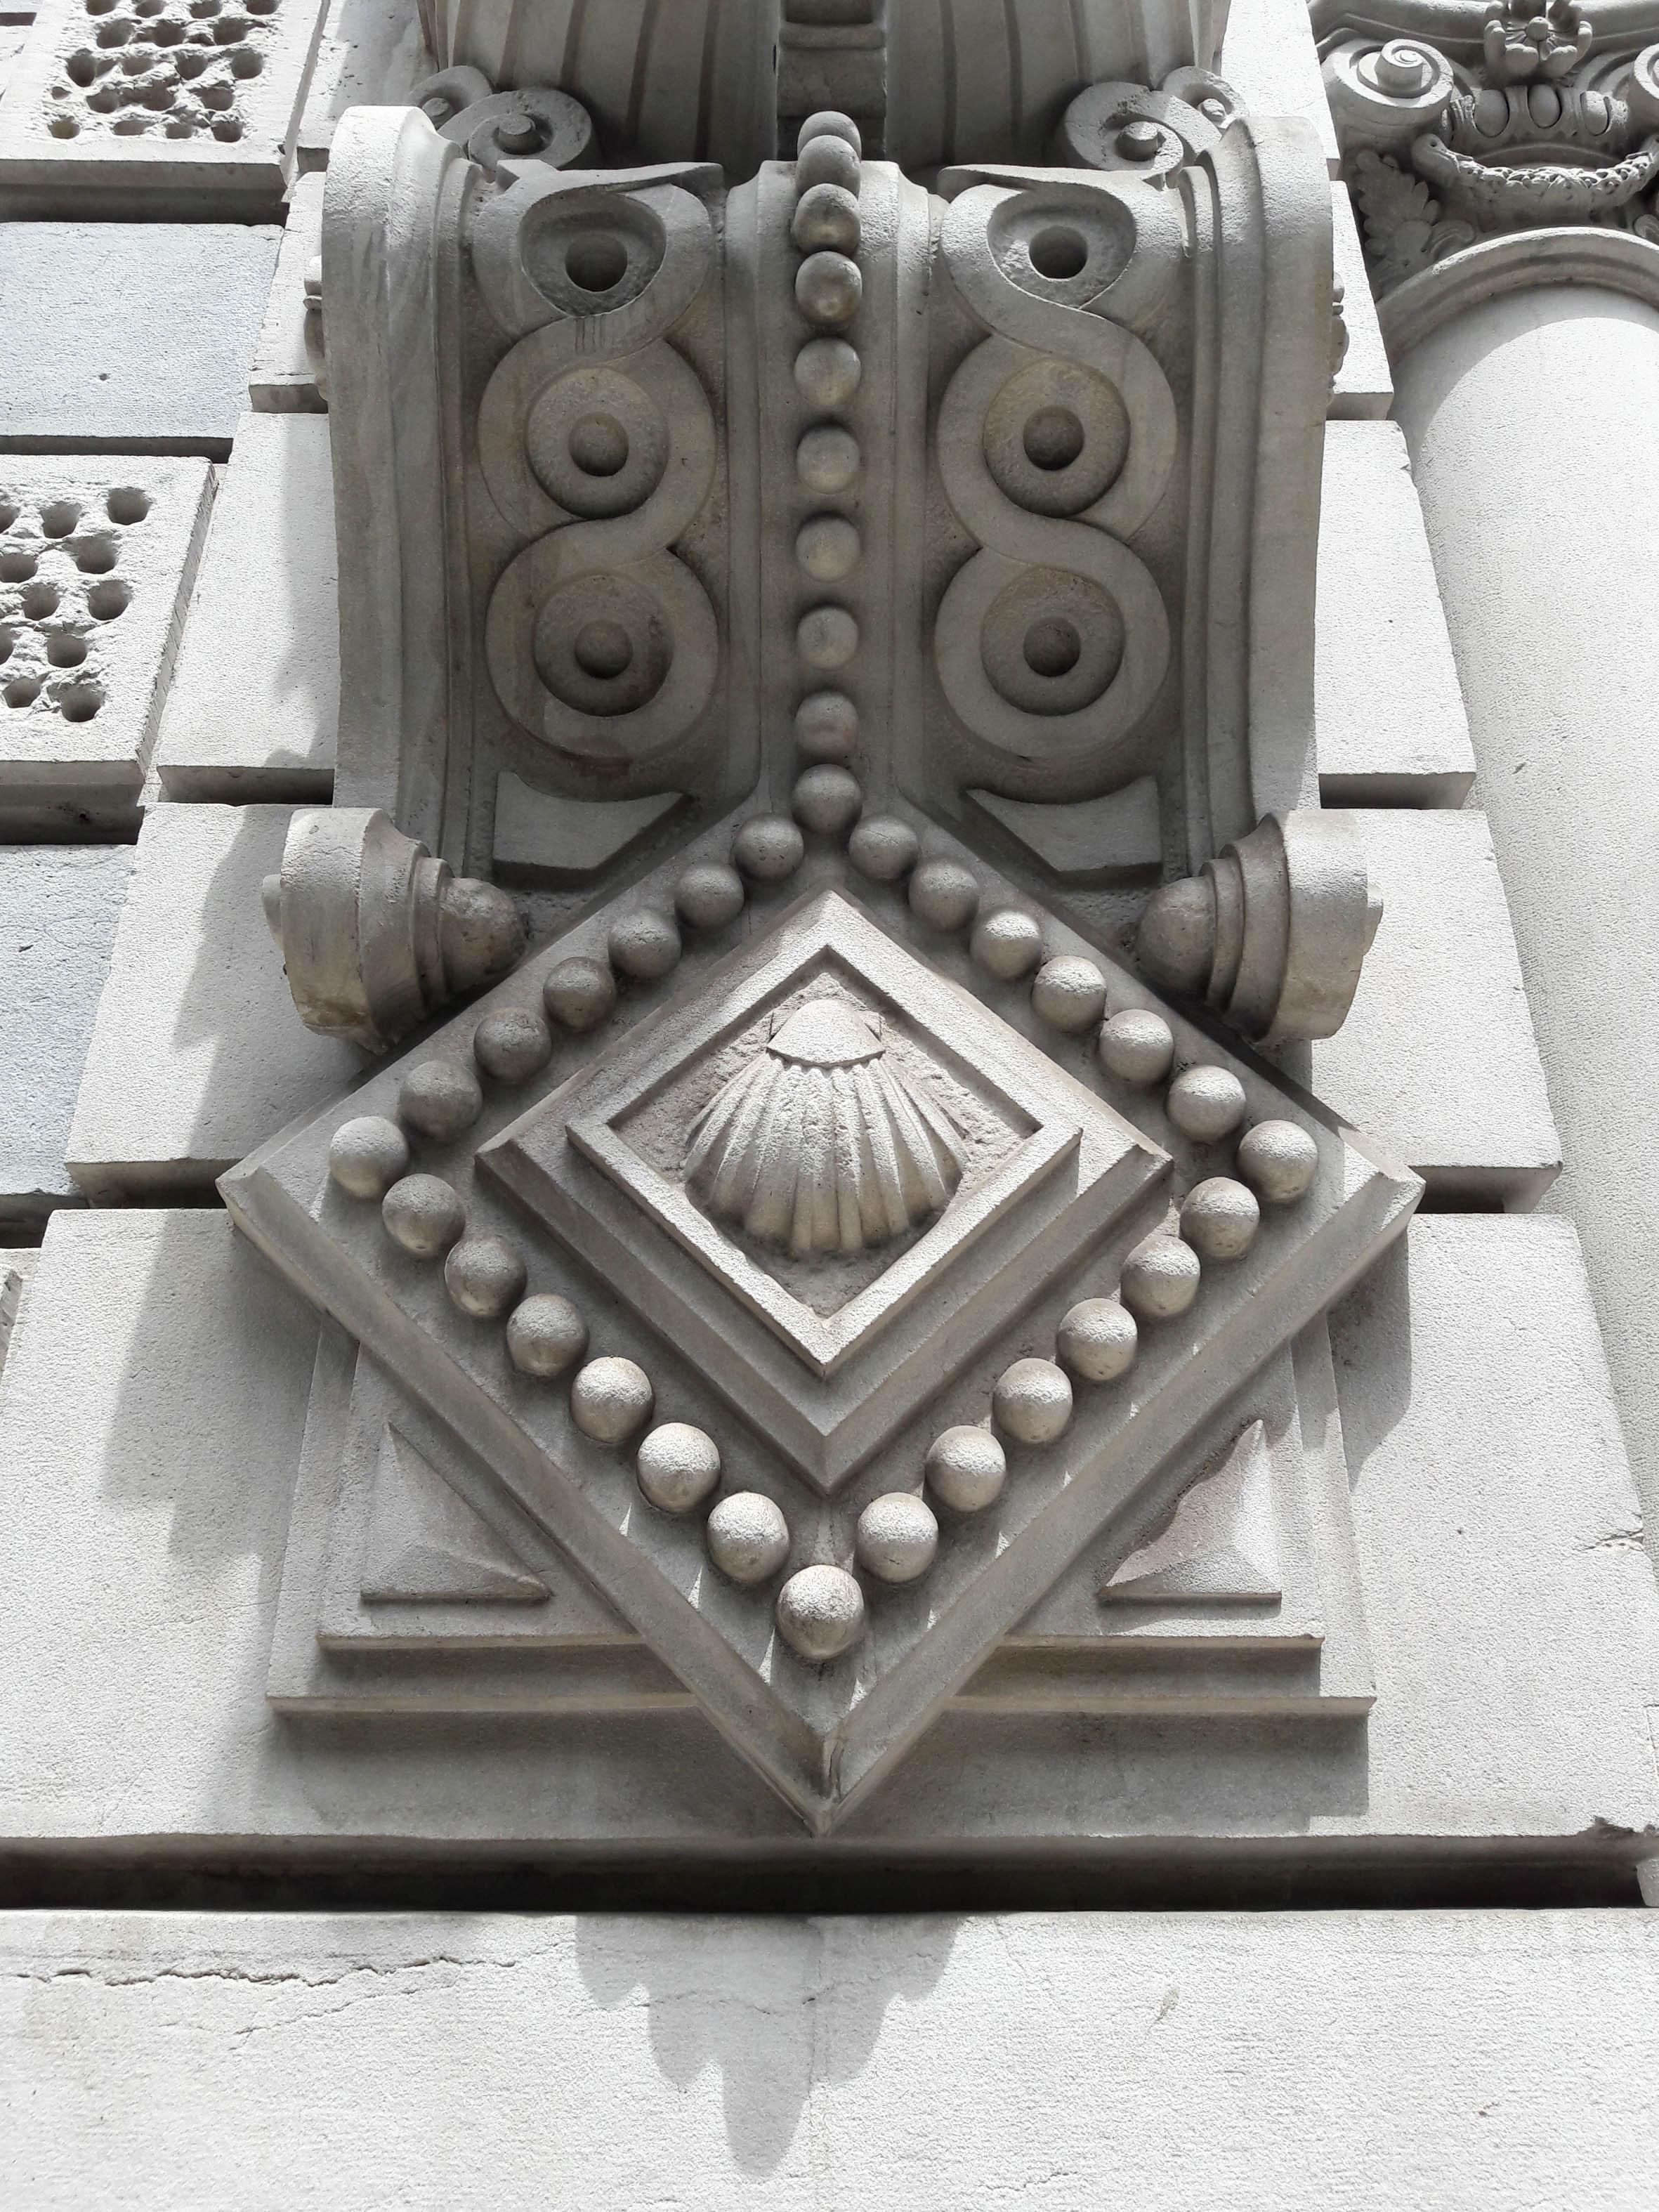 Scallop shell detail